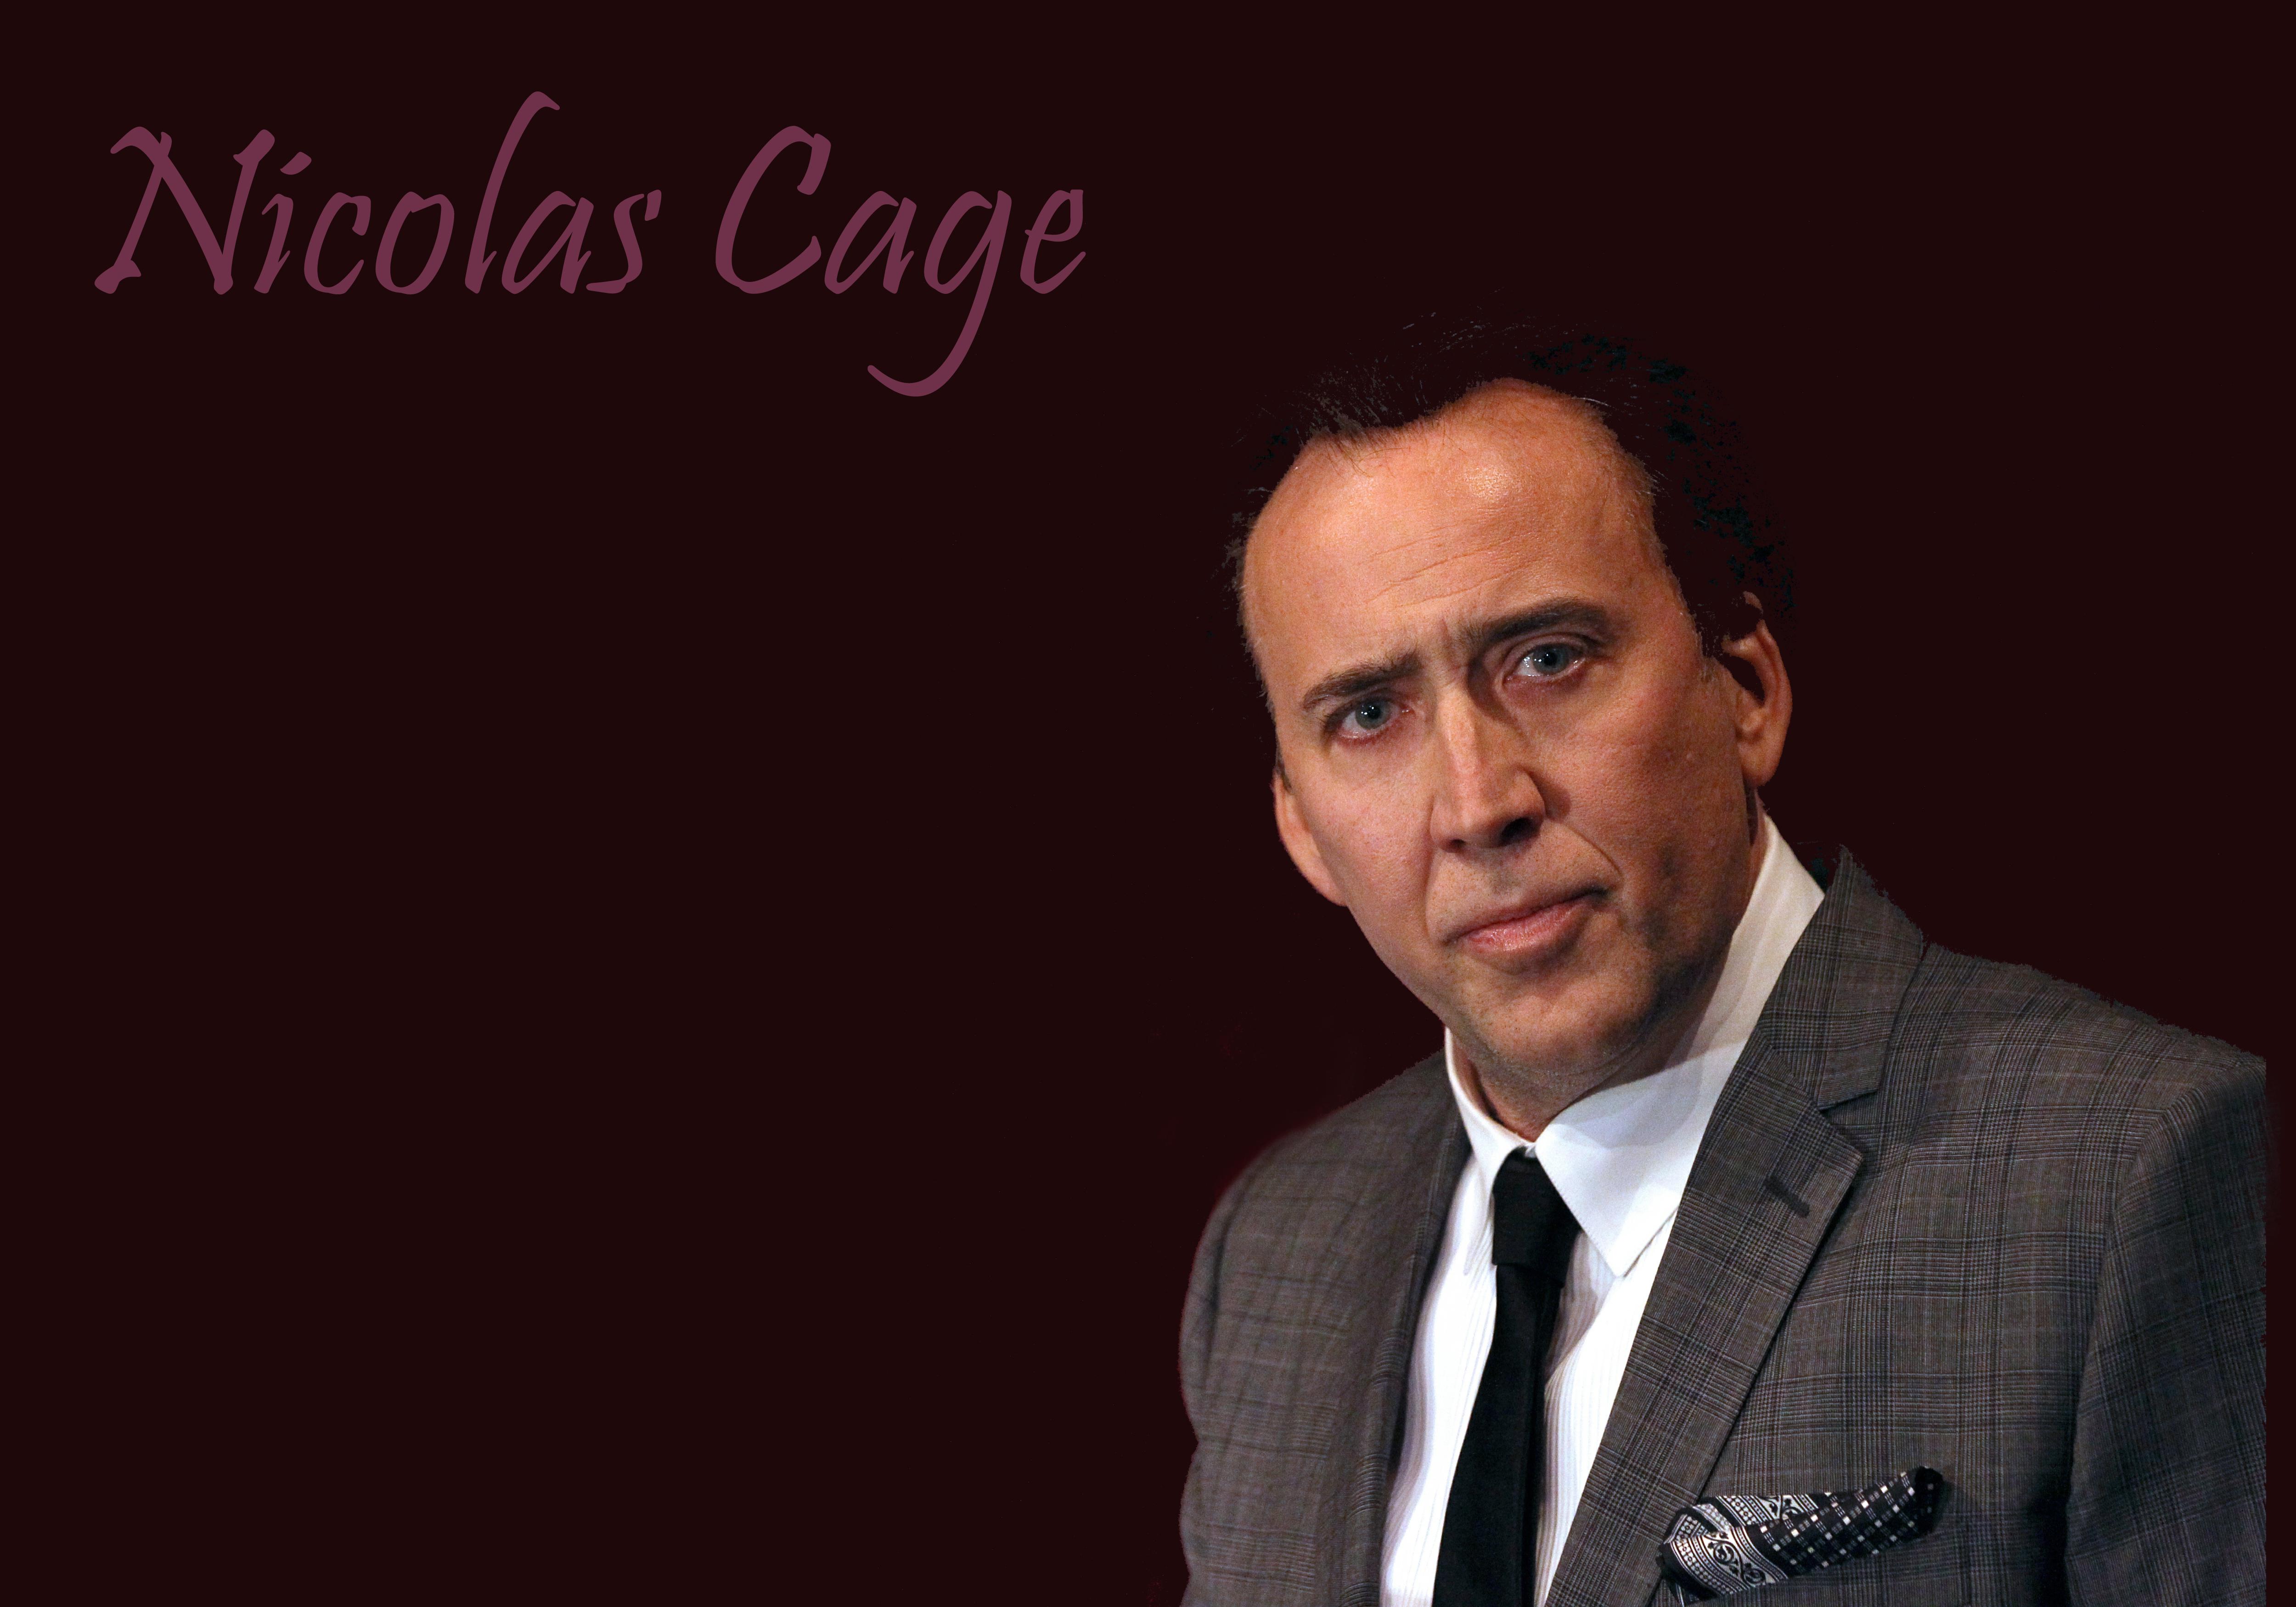 Nicolas Cage HD Wallpapers Sky HD Wallpaper 5000x3500